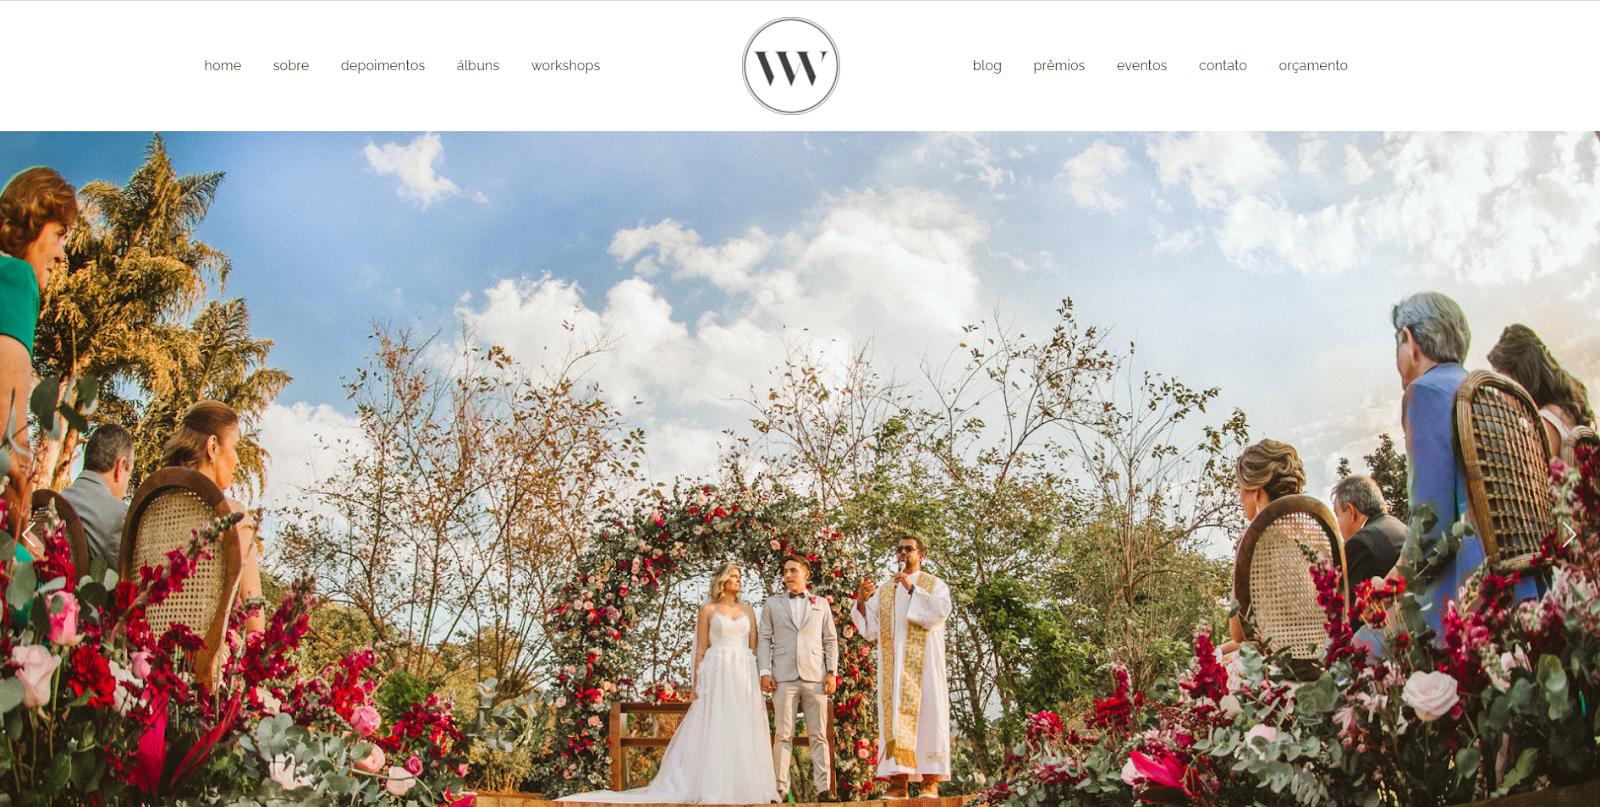 Site para fotógrafos: ValWander